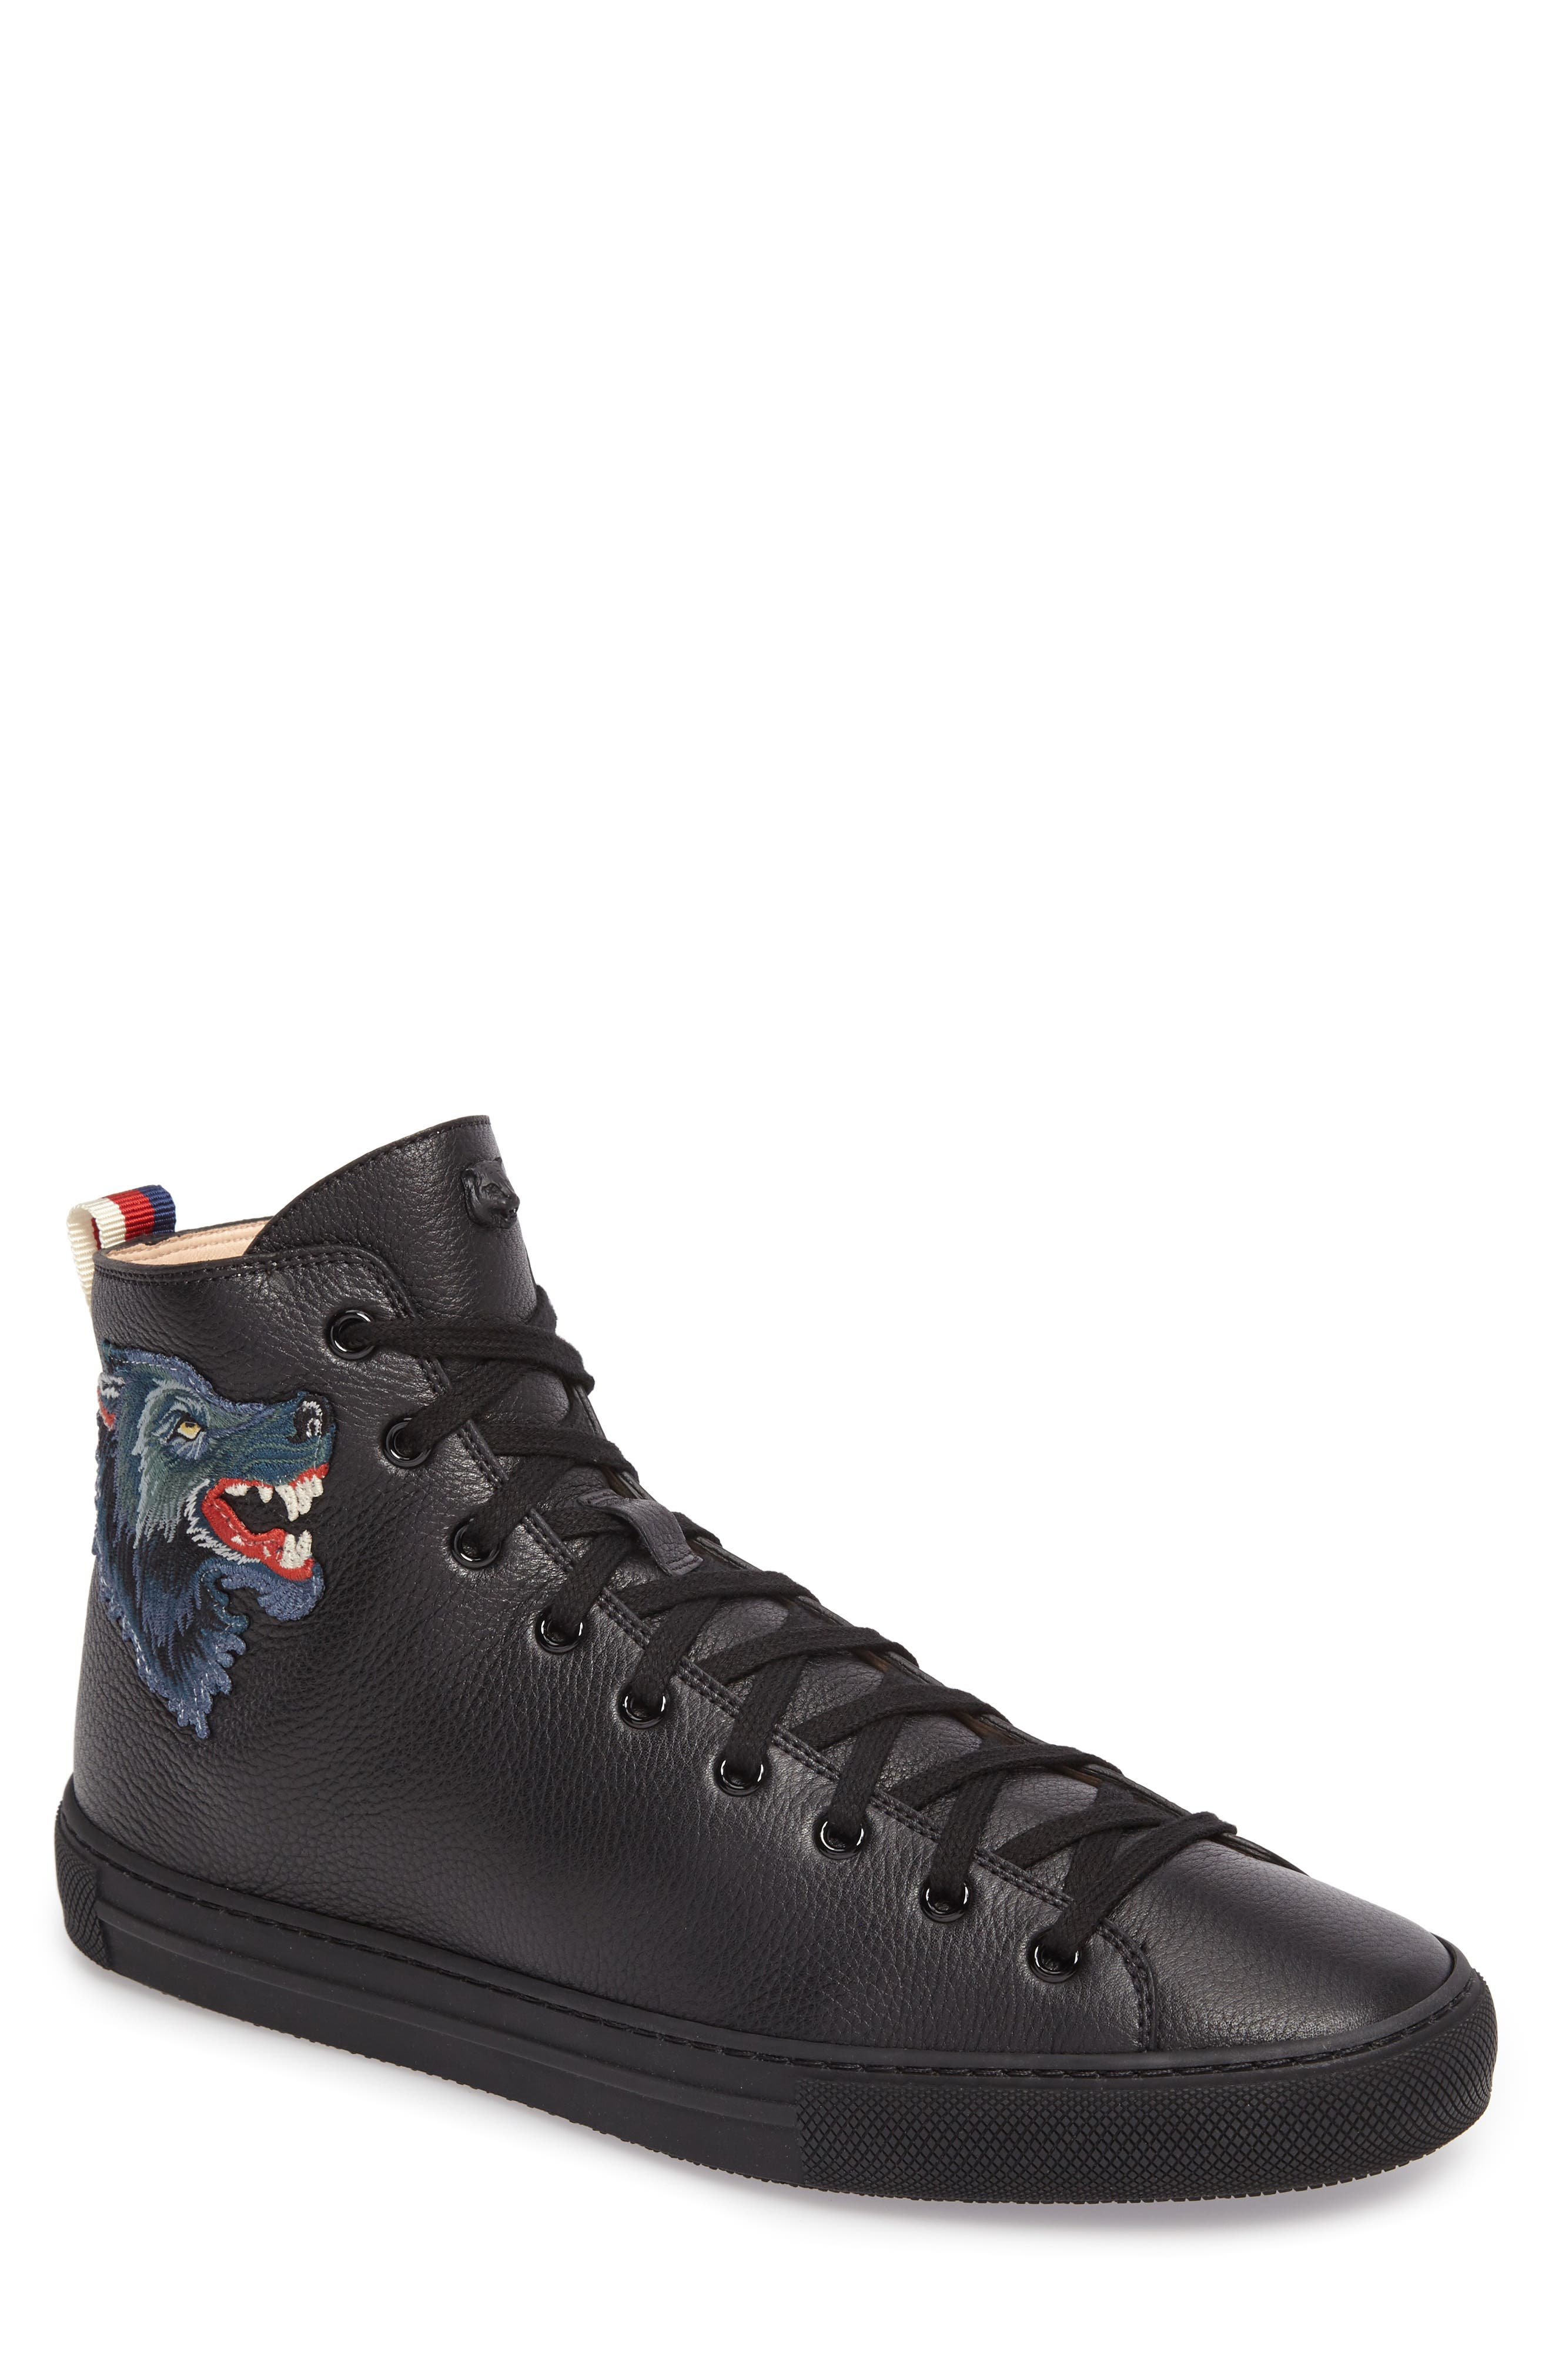 Main Image - Gucci Major Angry Wolf Sneaker (Men)